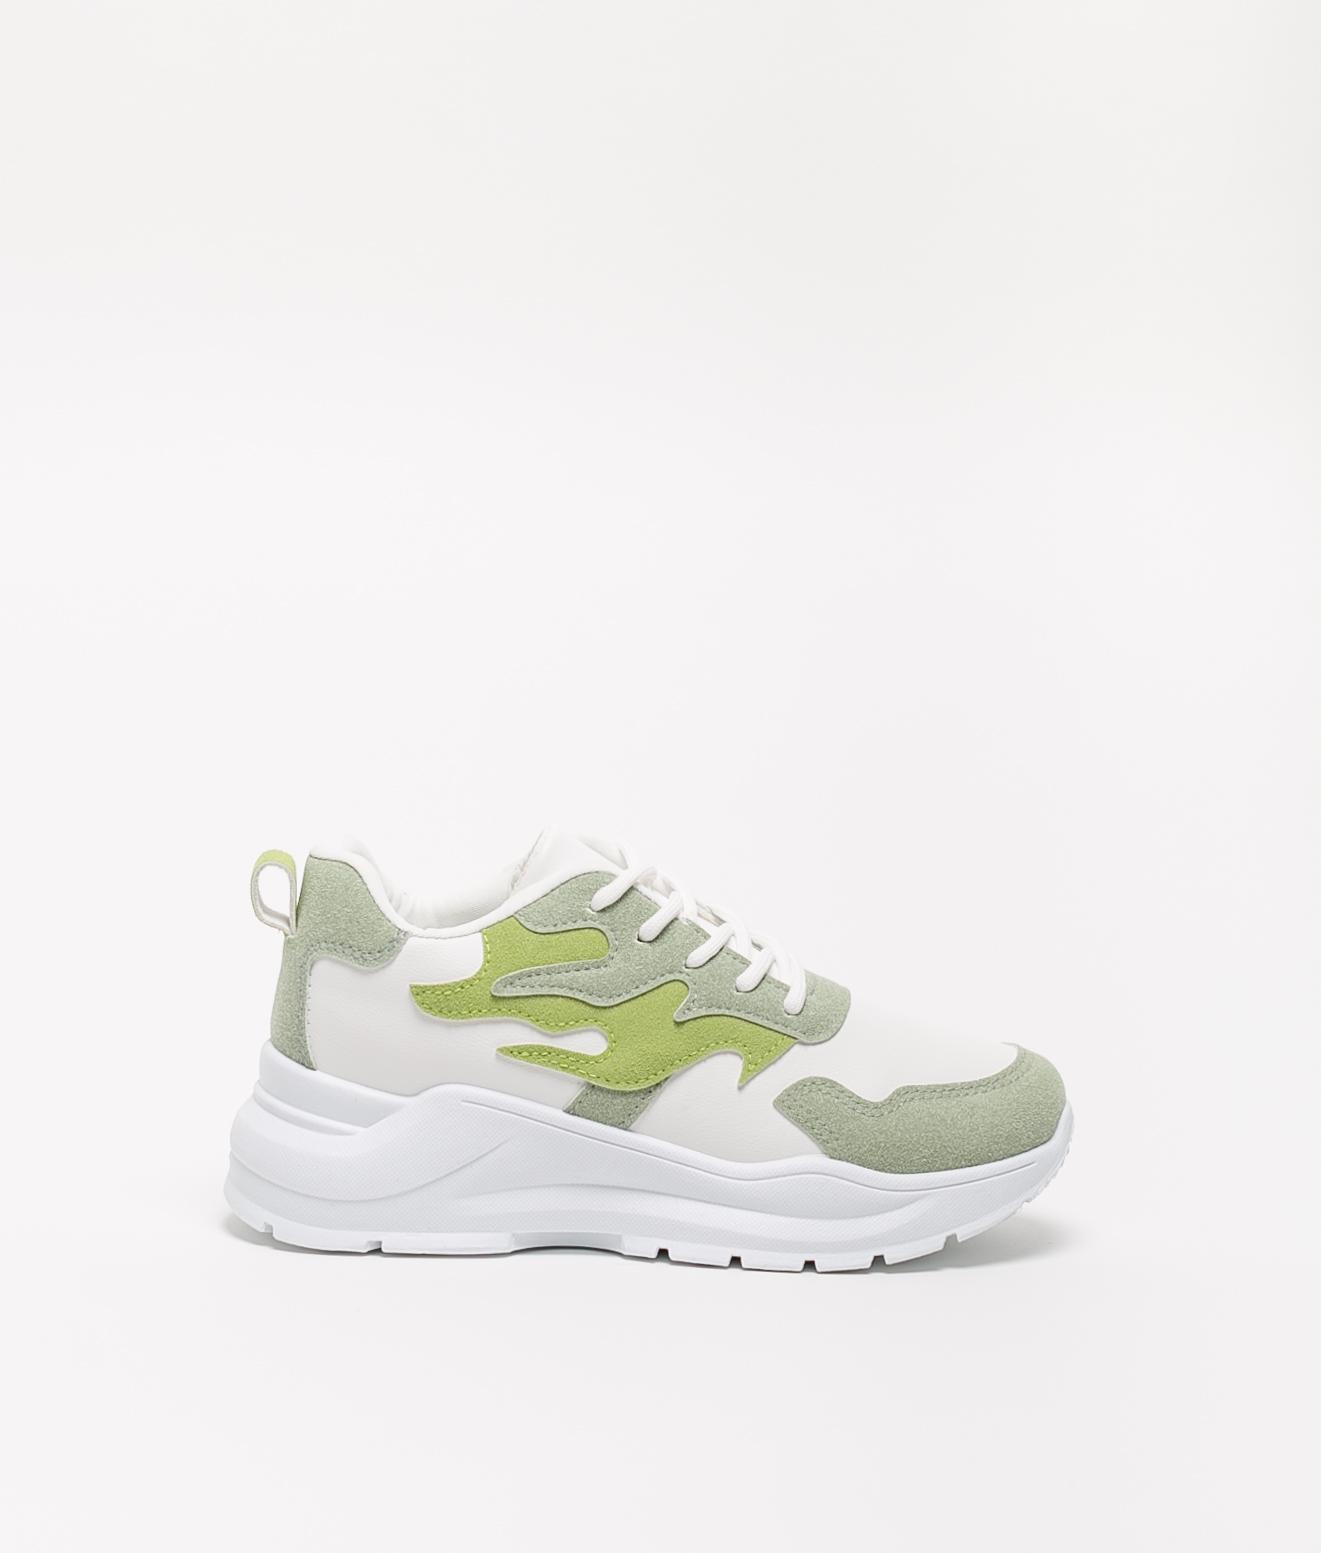 Sneakers Sunco - Green